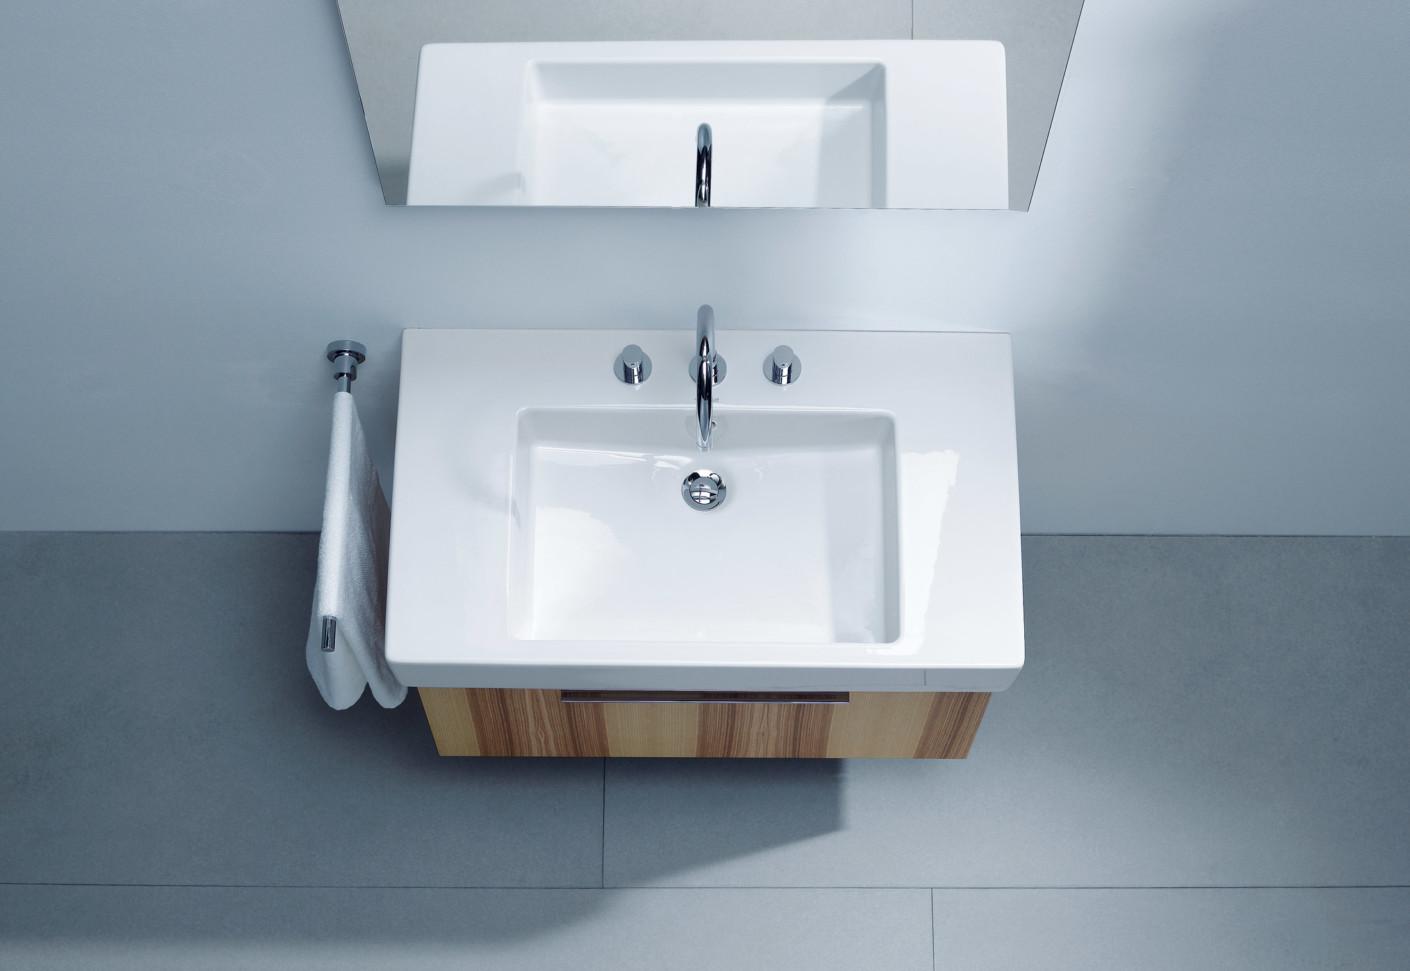 vero furniture washbasin by duravit stylepark. Black Bedroom Furniture Sets. Home Design Ideas